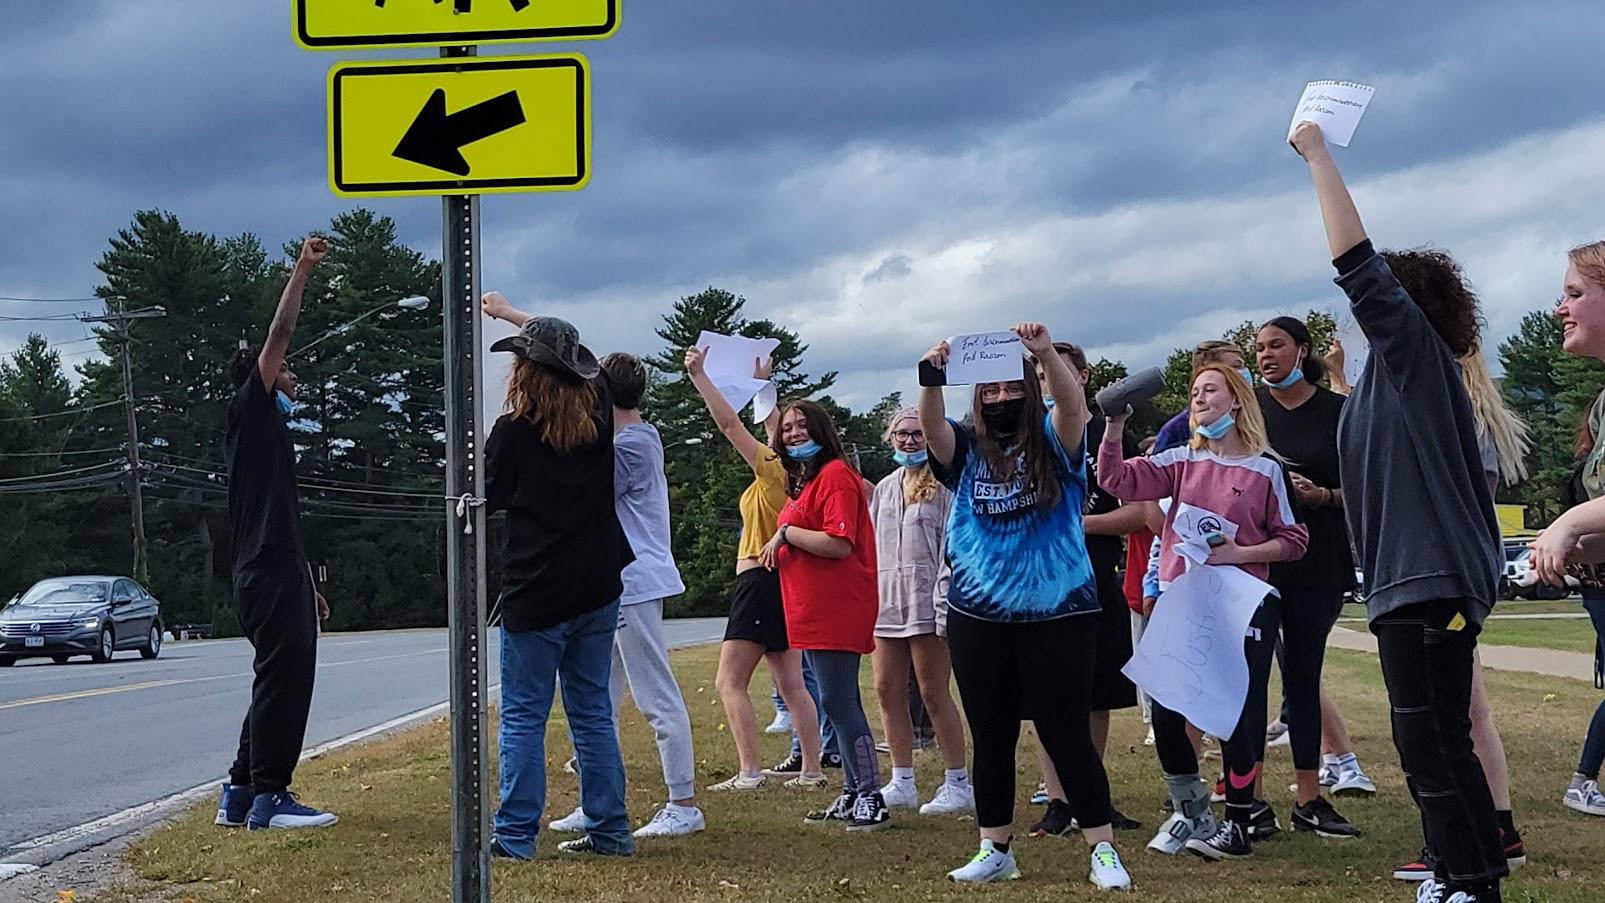 queensbury high school protest